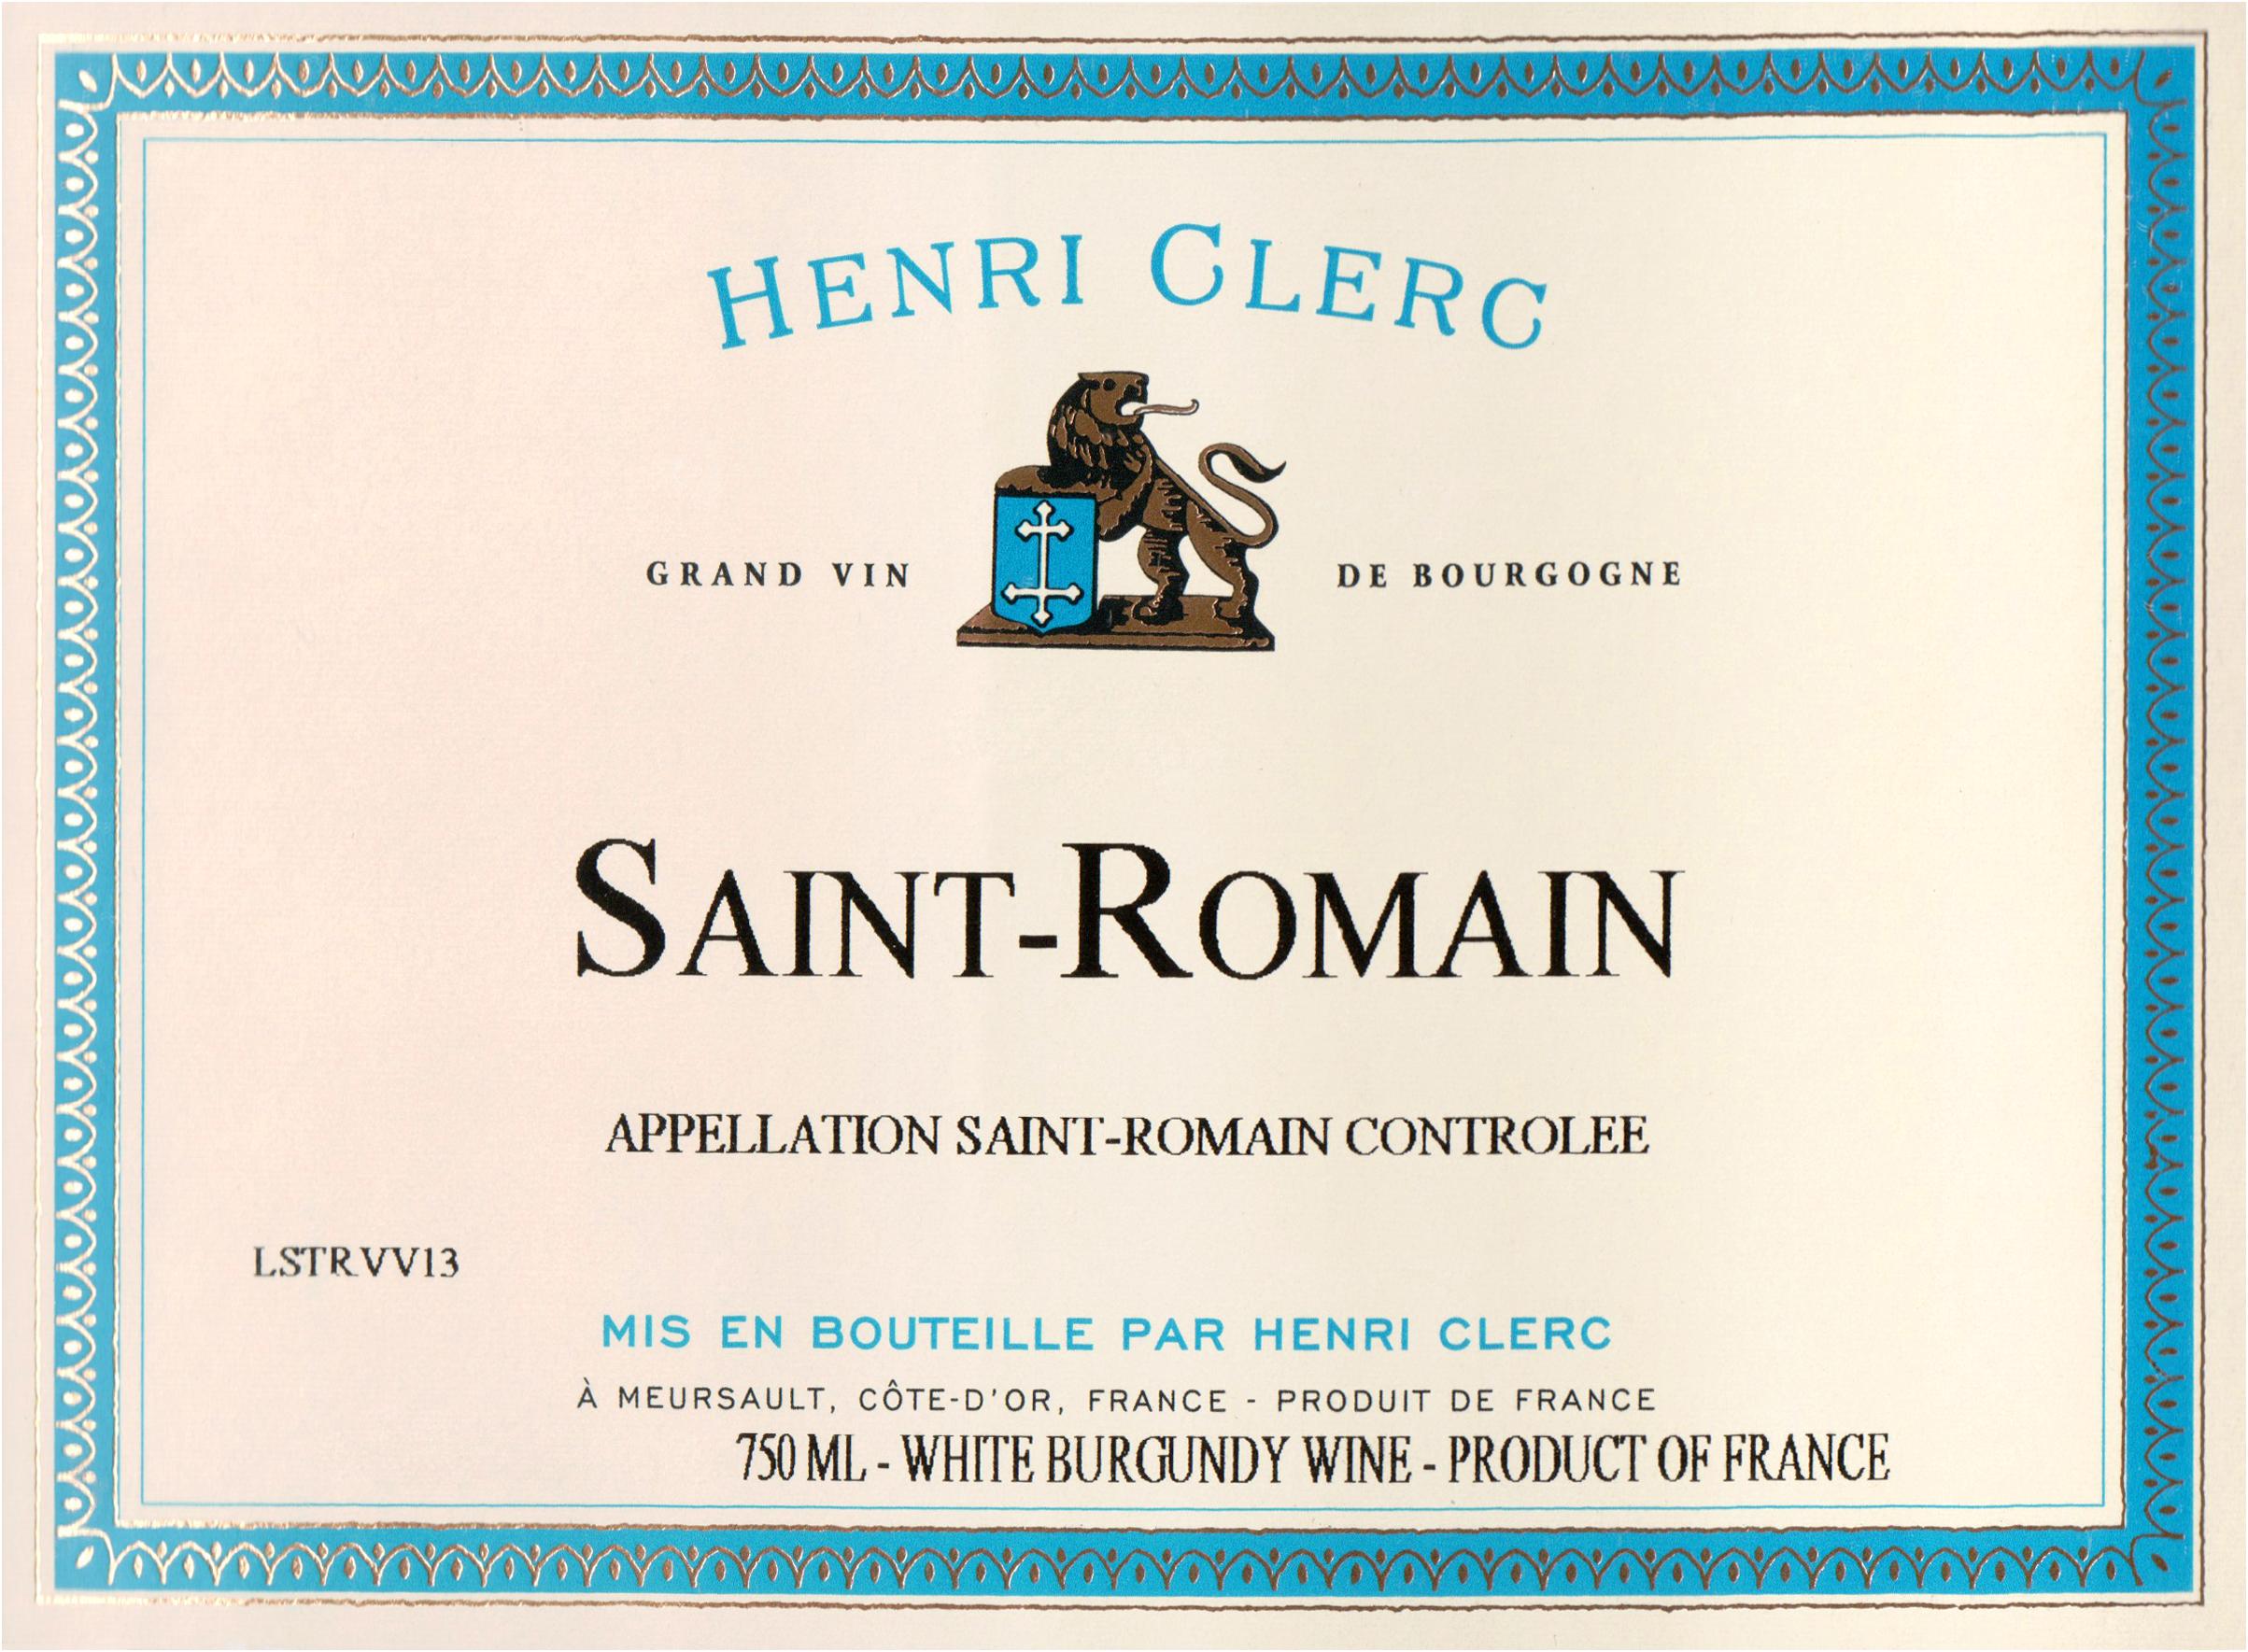 Henri Clerc Saint Romain Blanc 2015